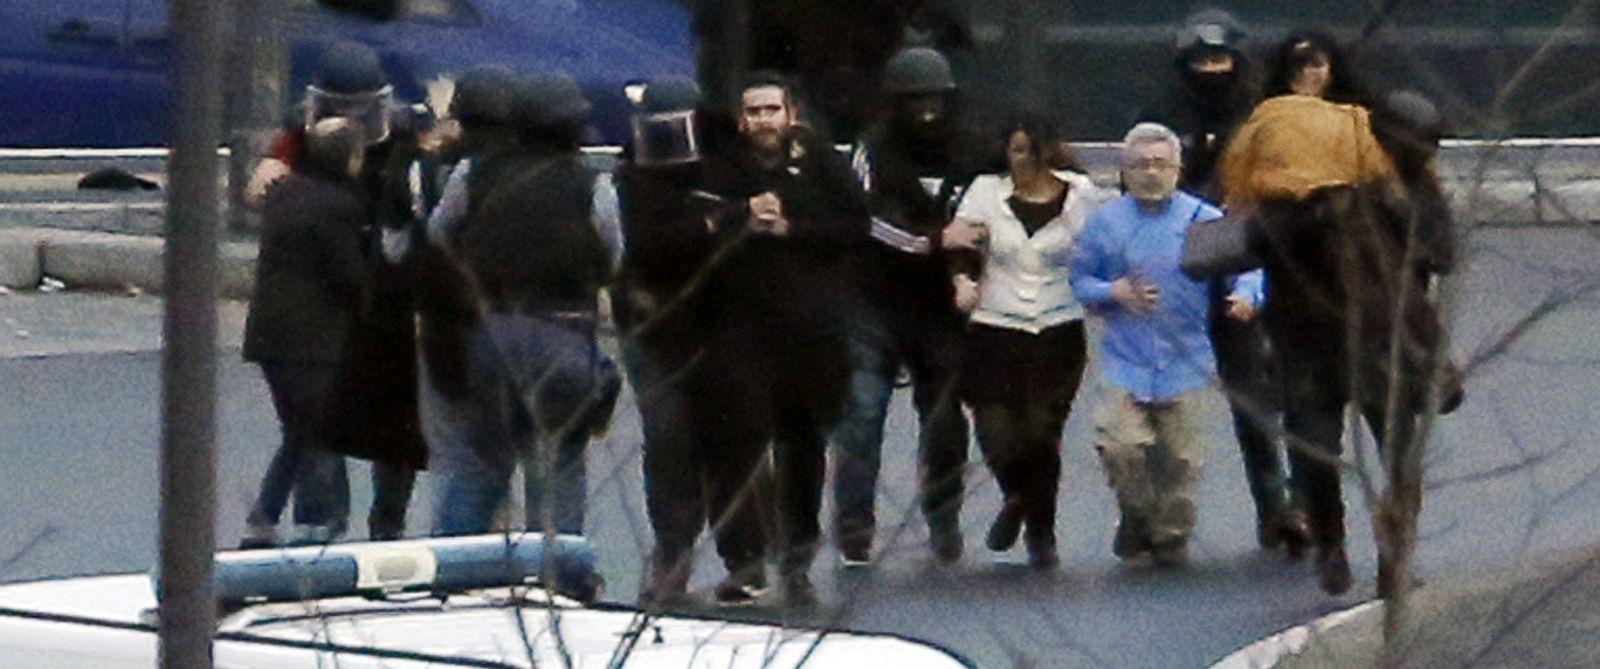 explosives found at site of paris market standoff abc news